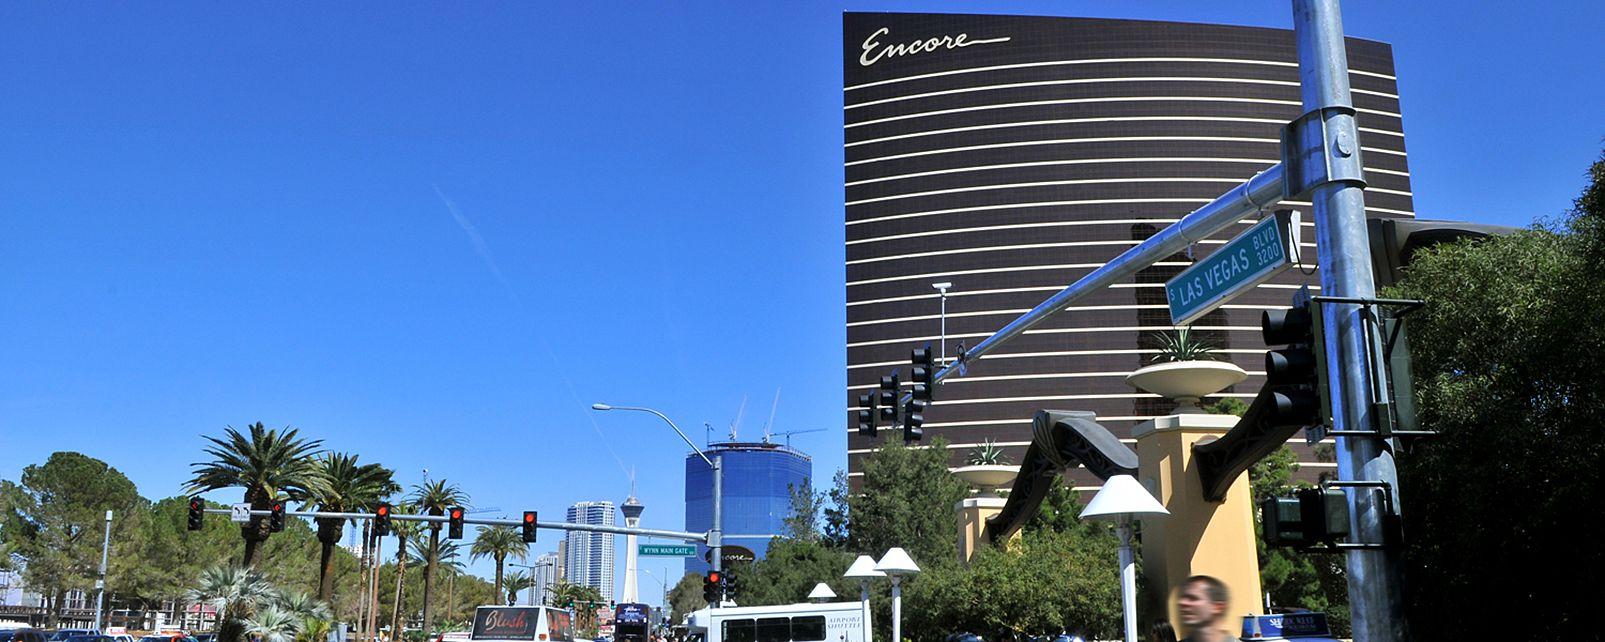 Hôtel Encore at Wynn Las Vegas